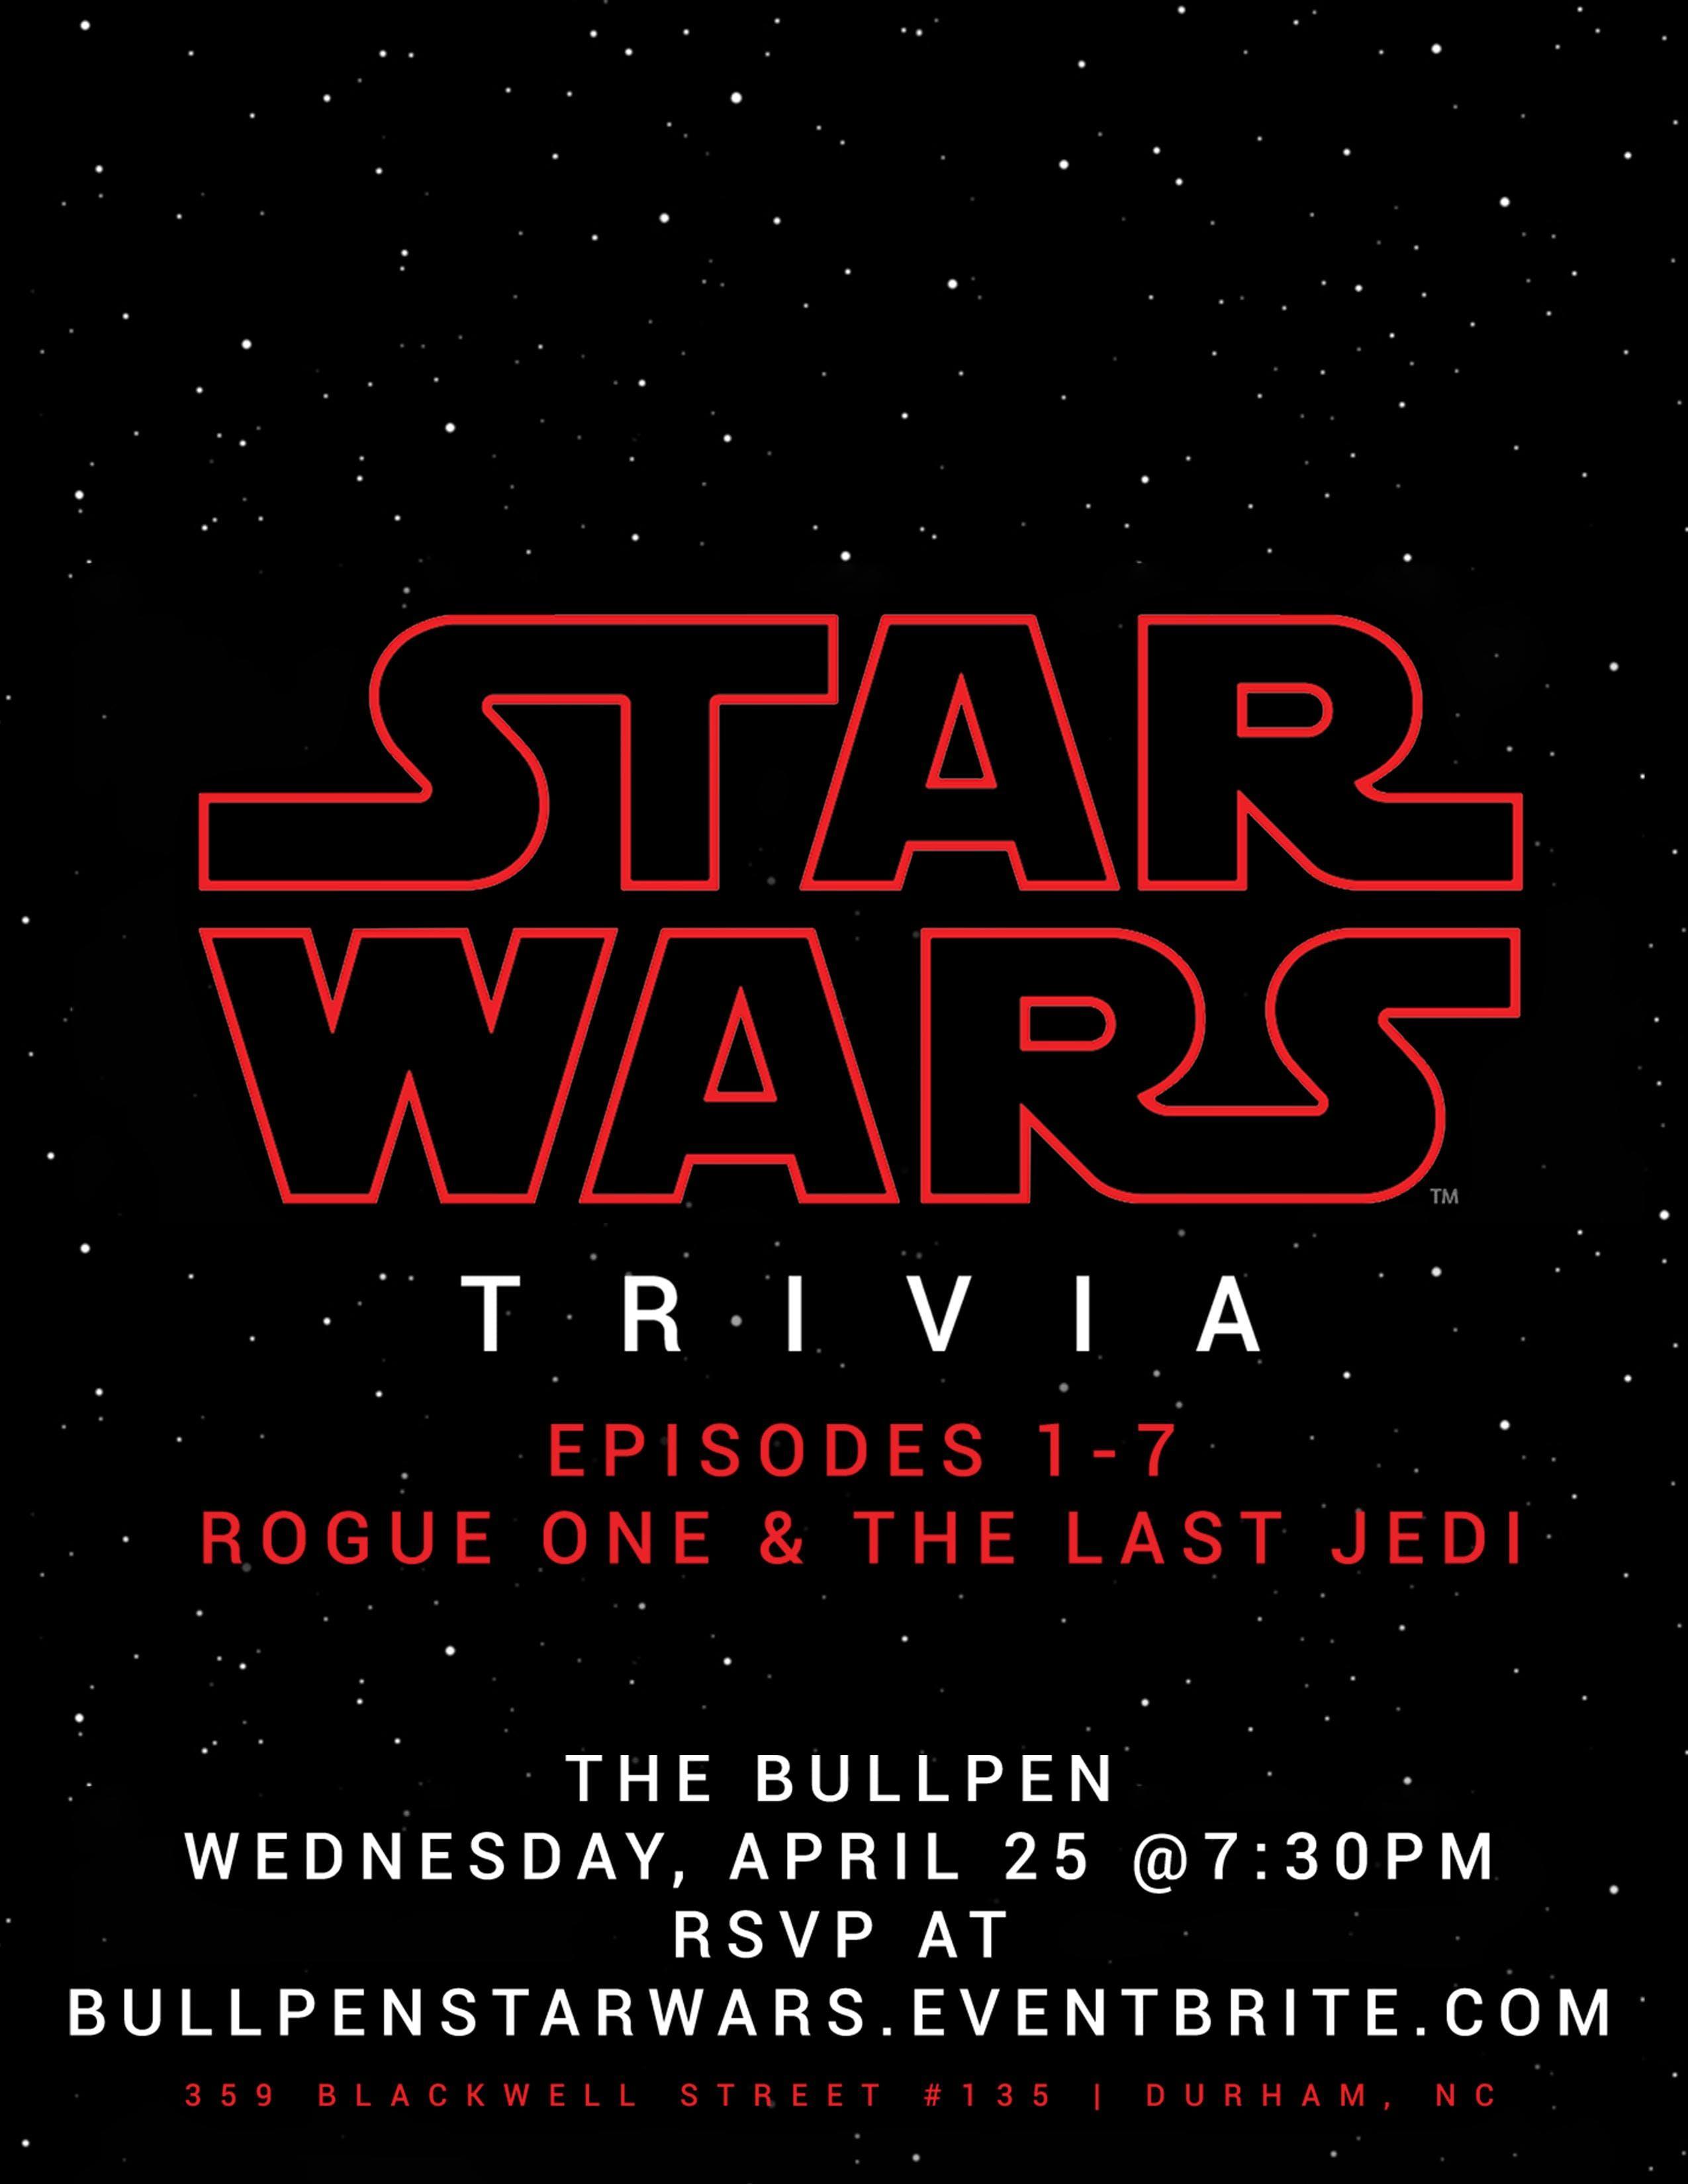 Star Wars Trivia @ The Bullpen